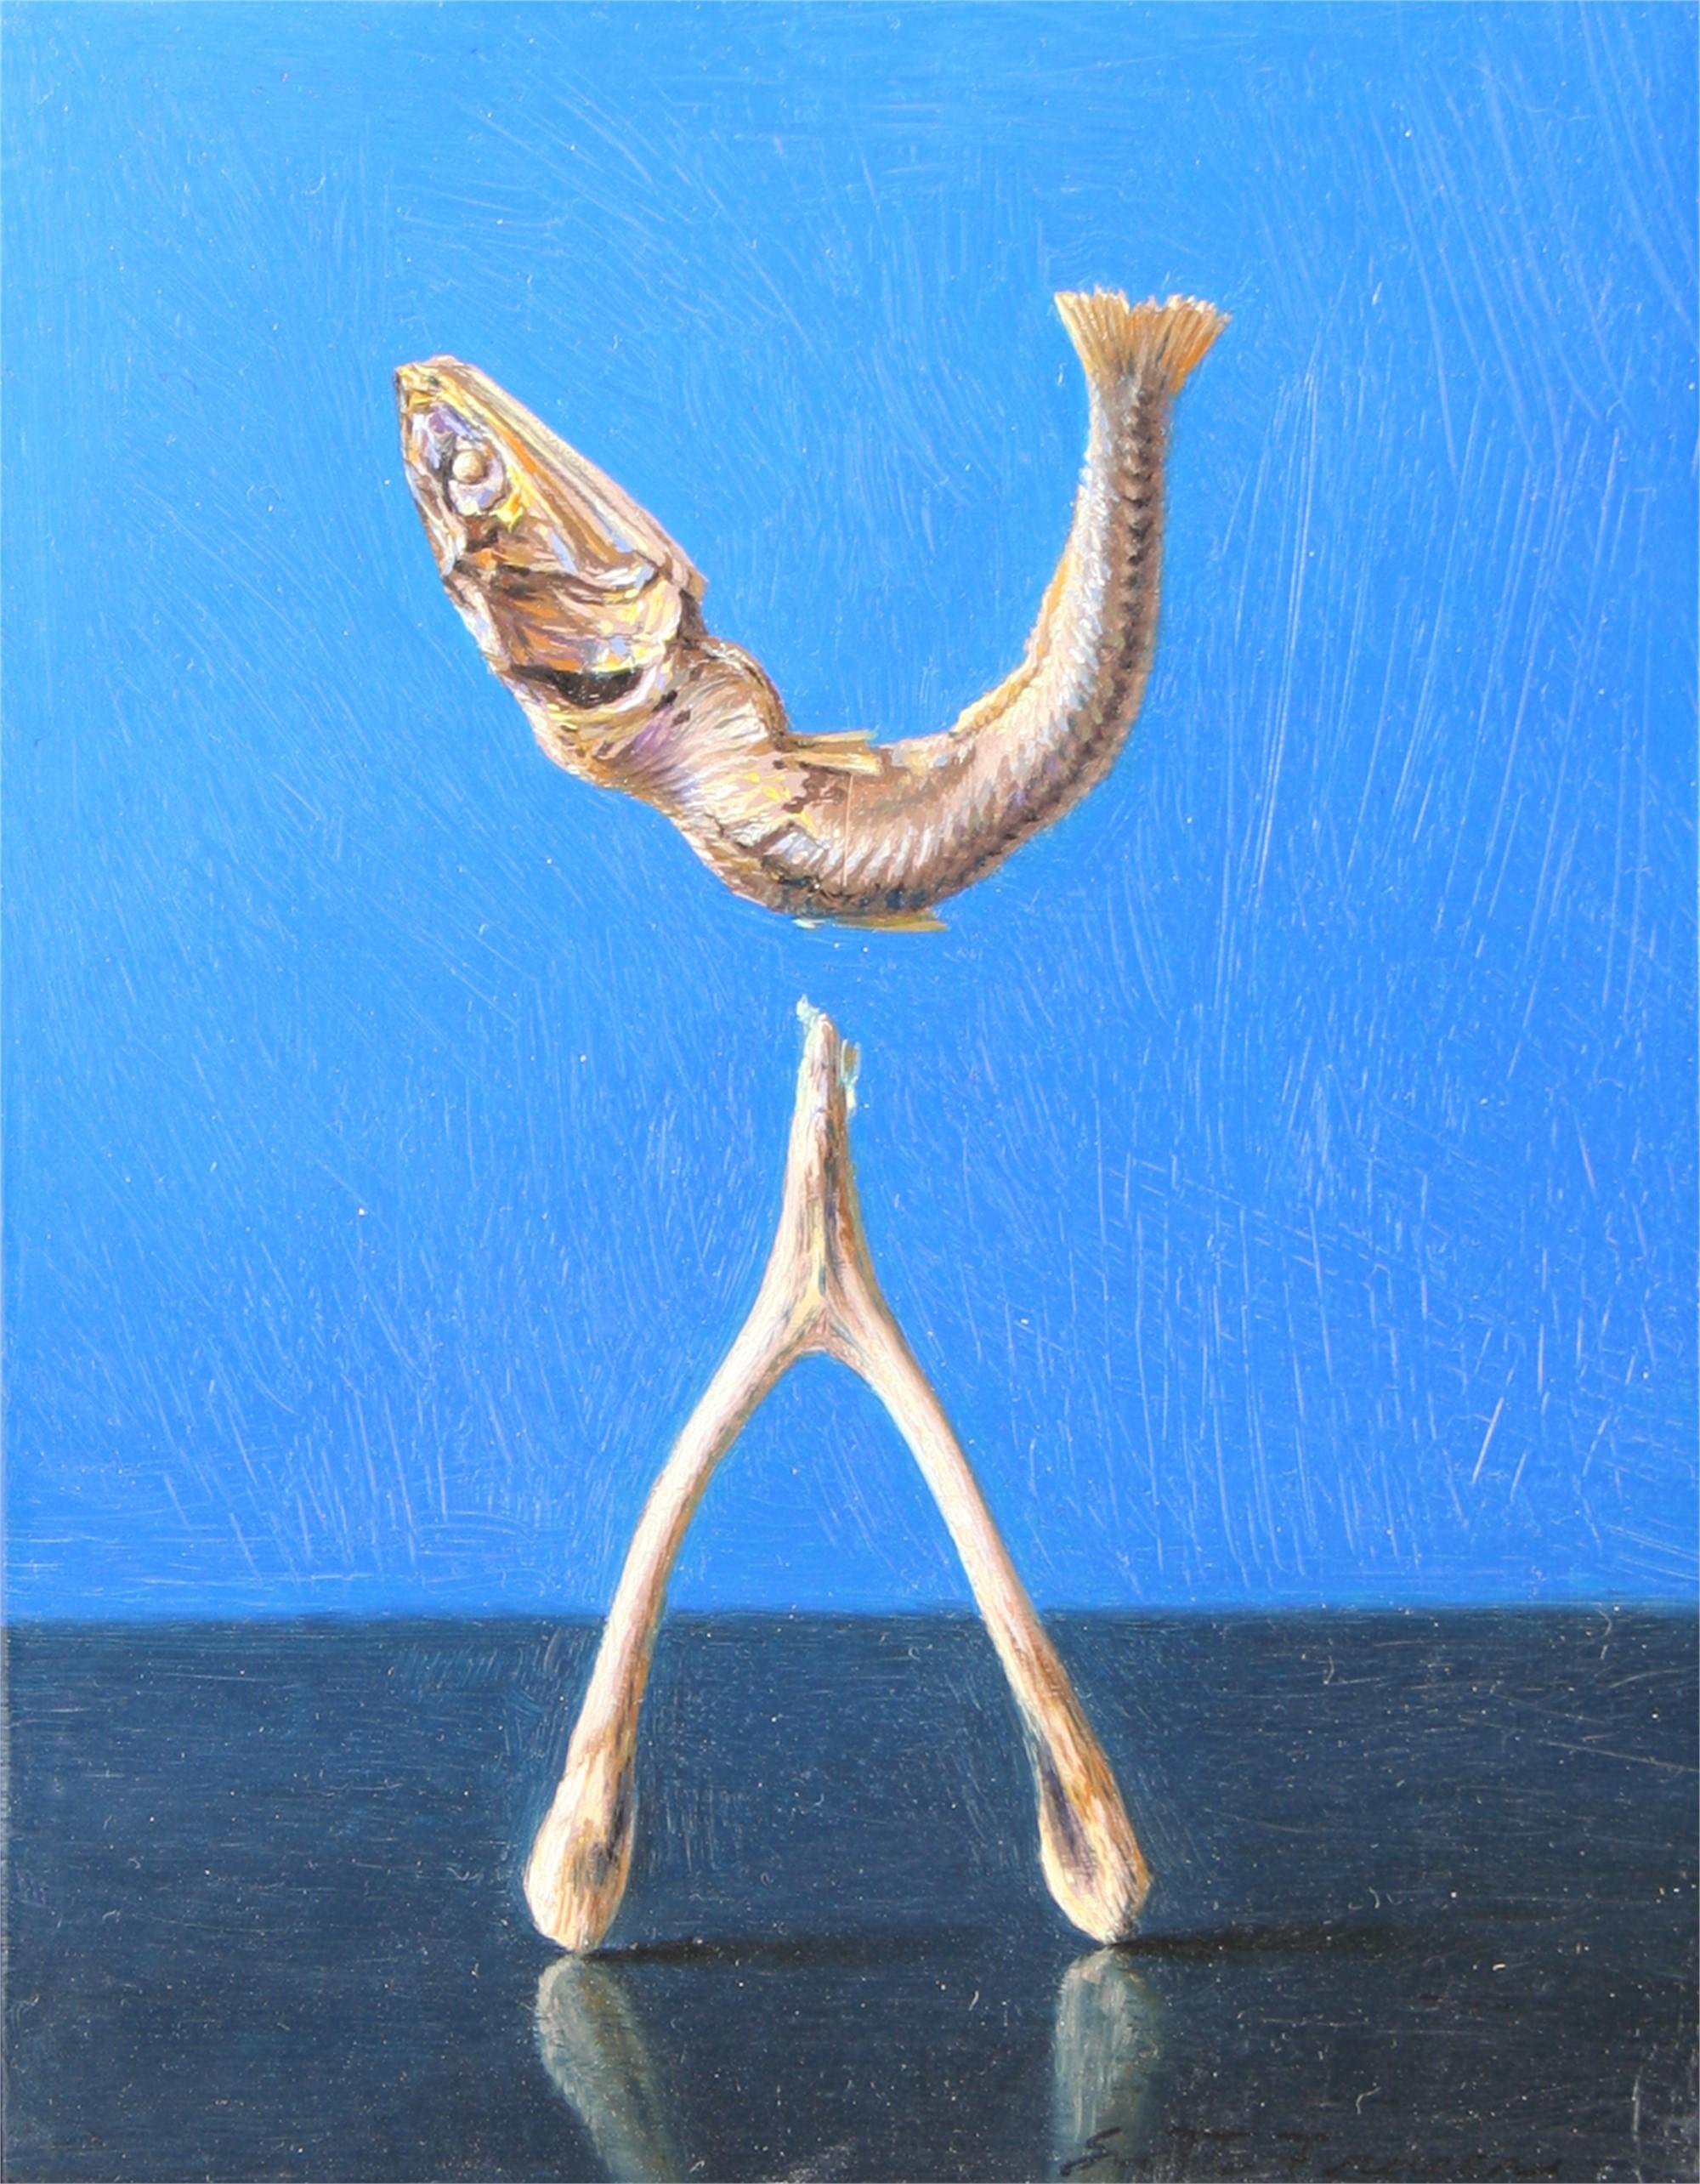 Fish Wish by Scott Fraser